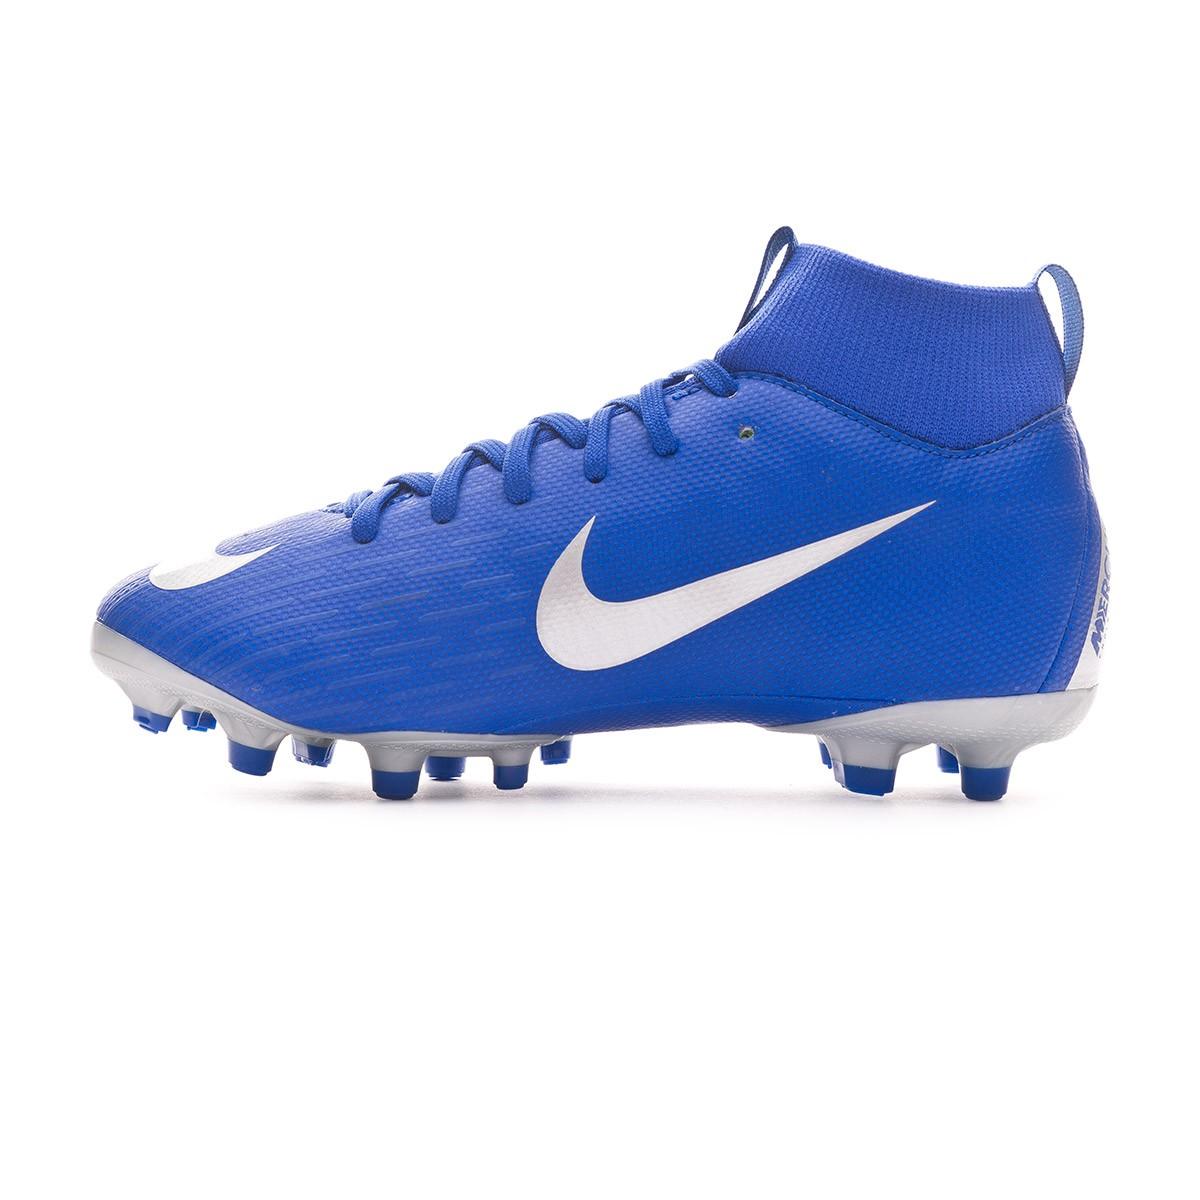 Chaussure de foot Nike Mercurial Superfly VI Academy MG enfant